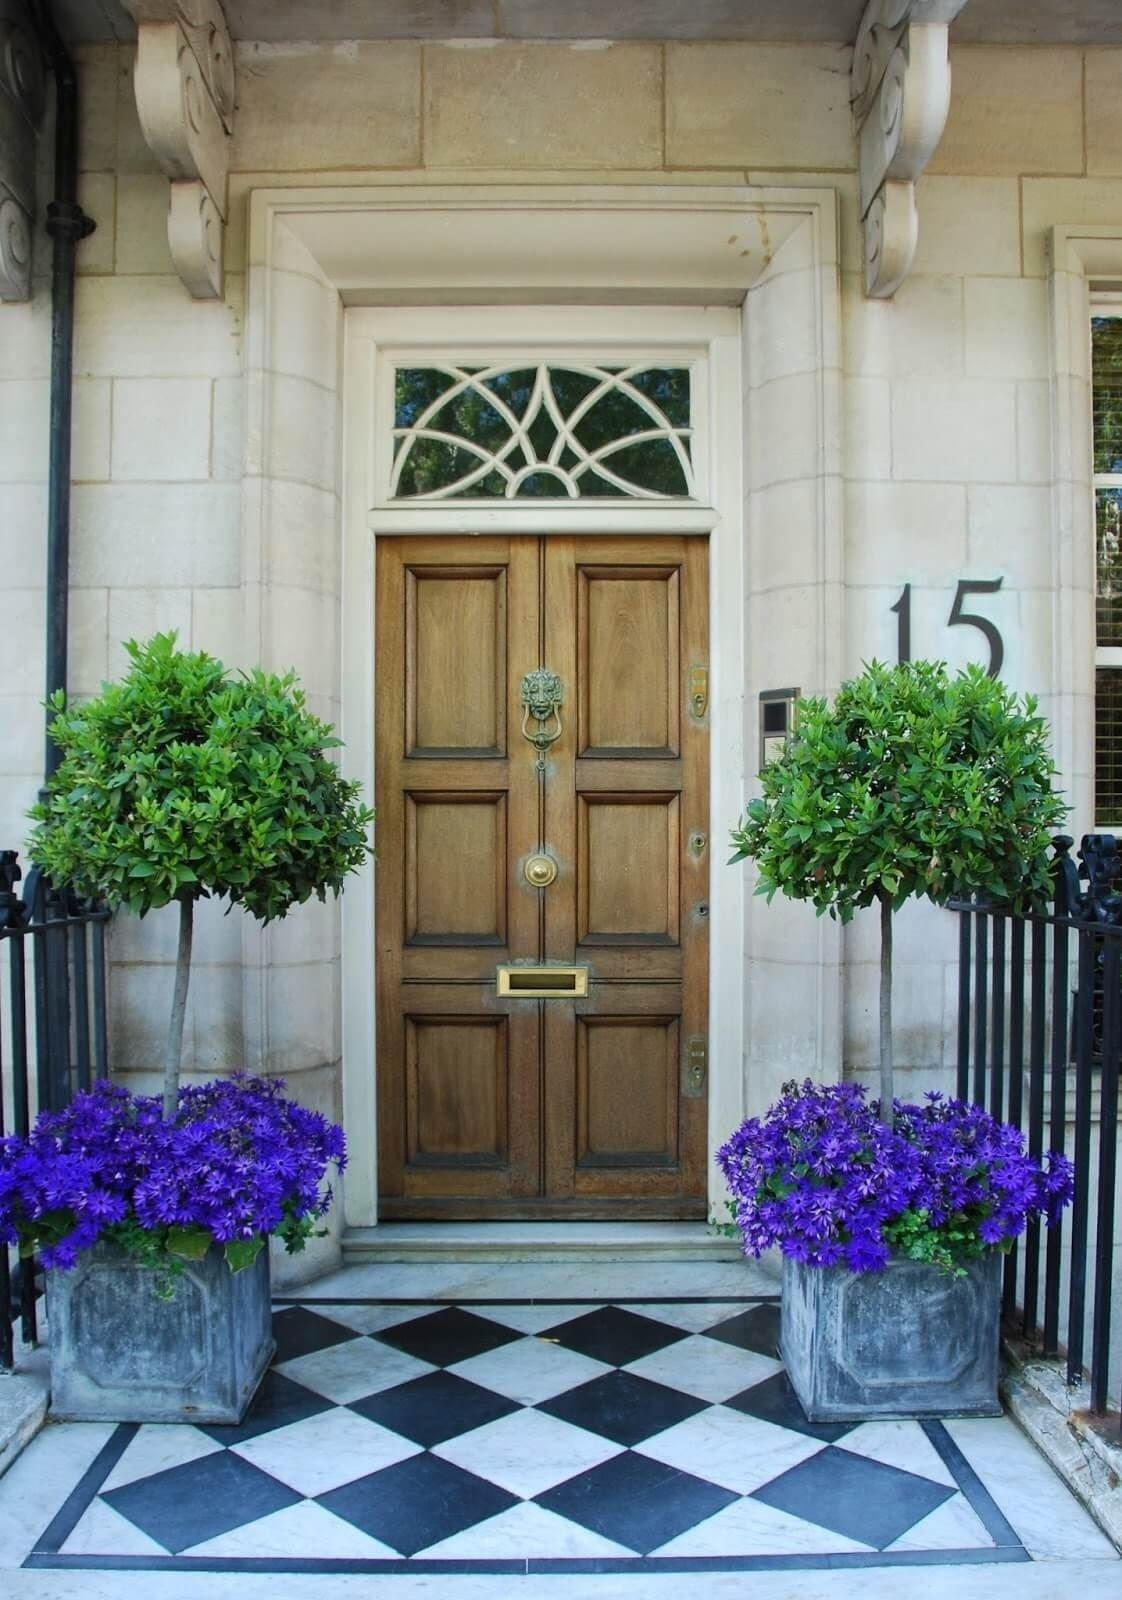 10 Fashionable Flower Pot Ideas For Front Porch 29 best front door flower pots ideas and designs for 2018 7 2021